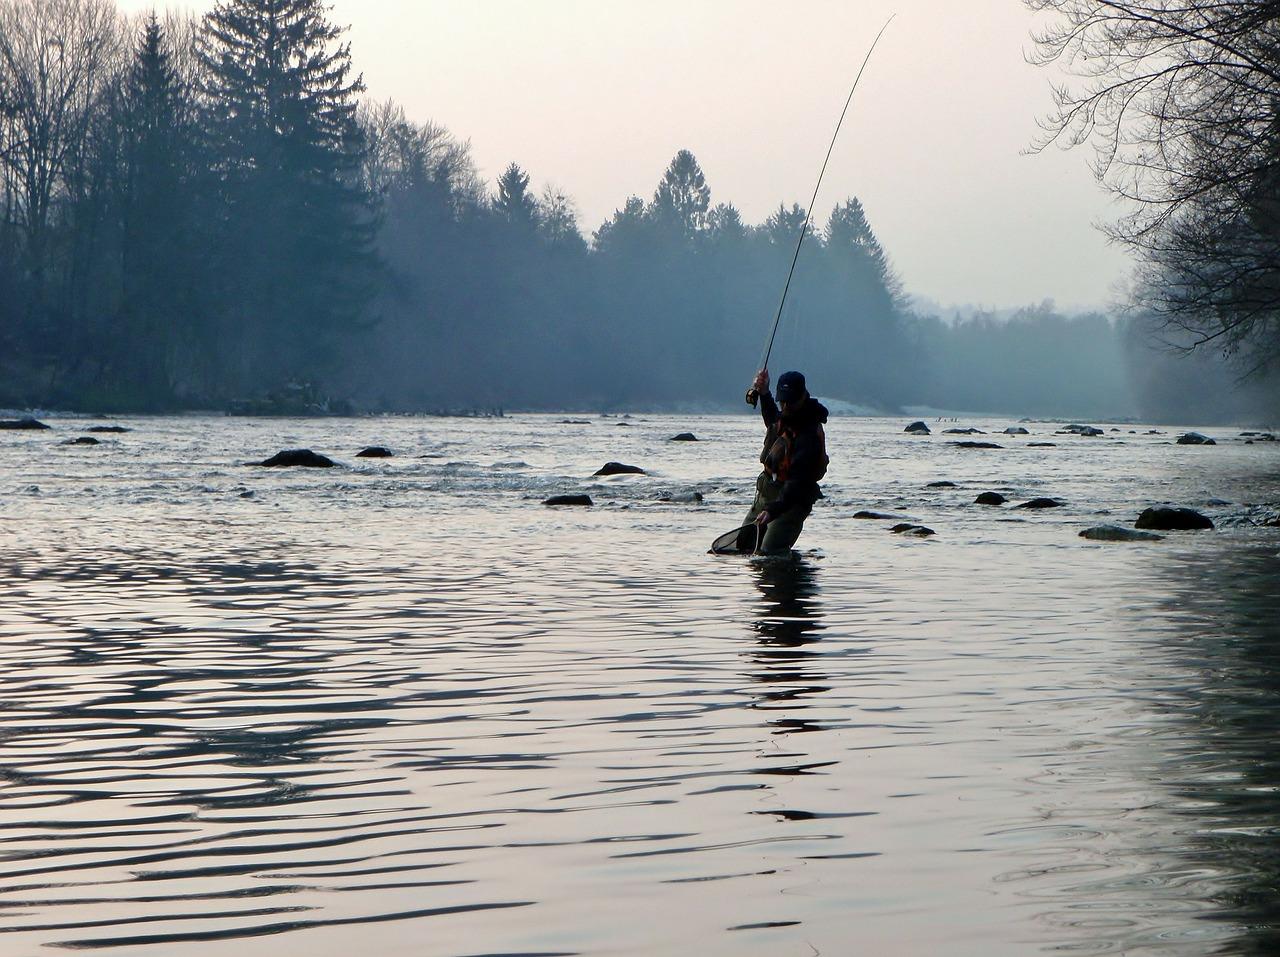 Аренда коттеджа в финляндии на берегу озера с рыбалкой